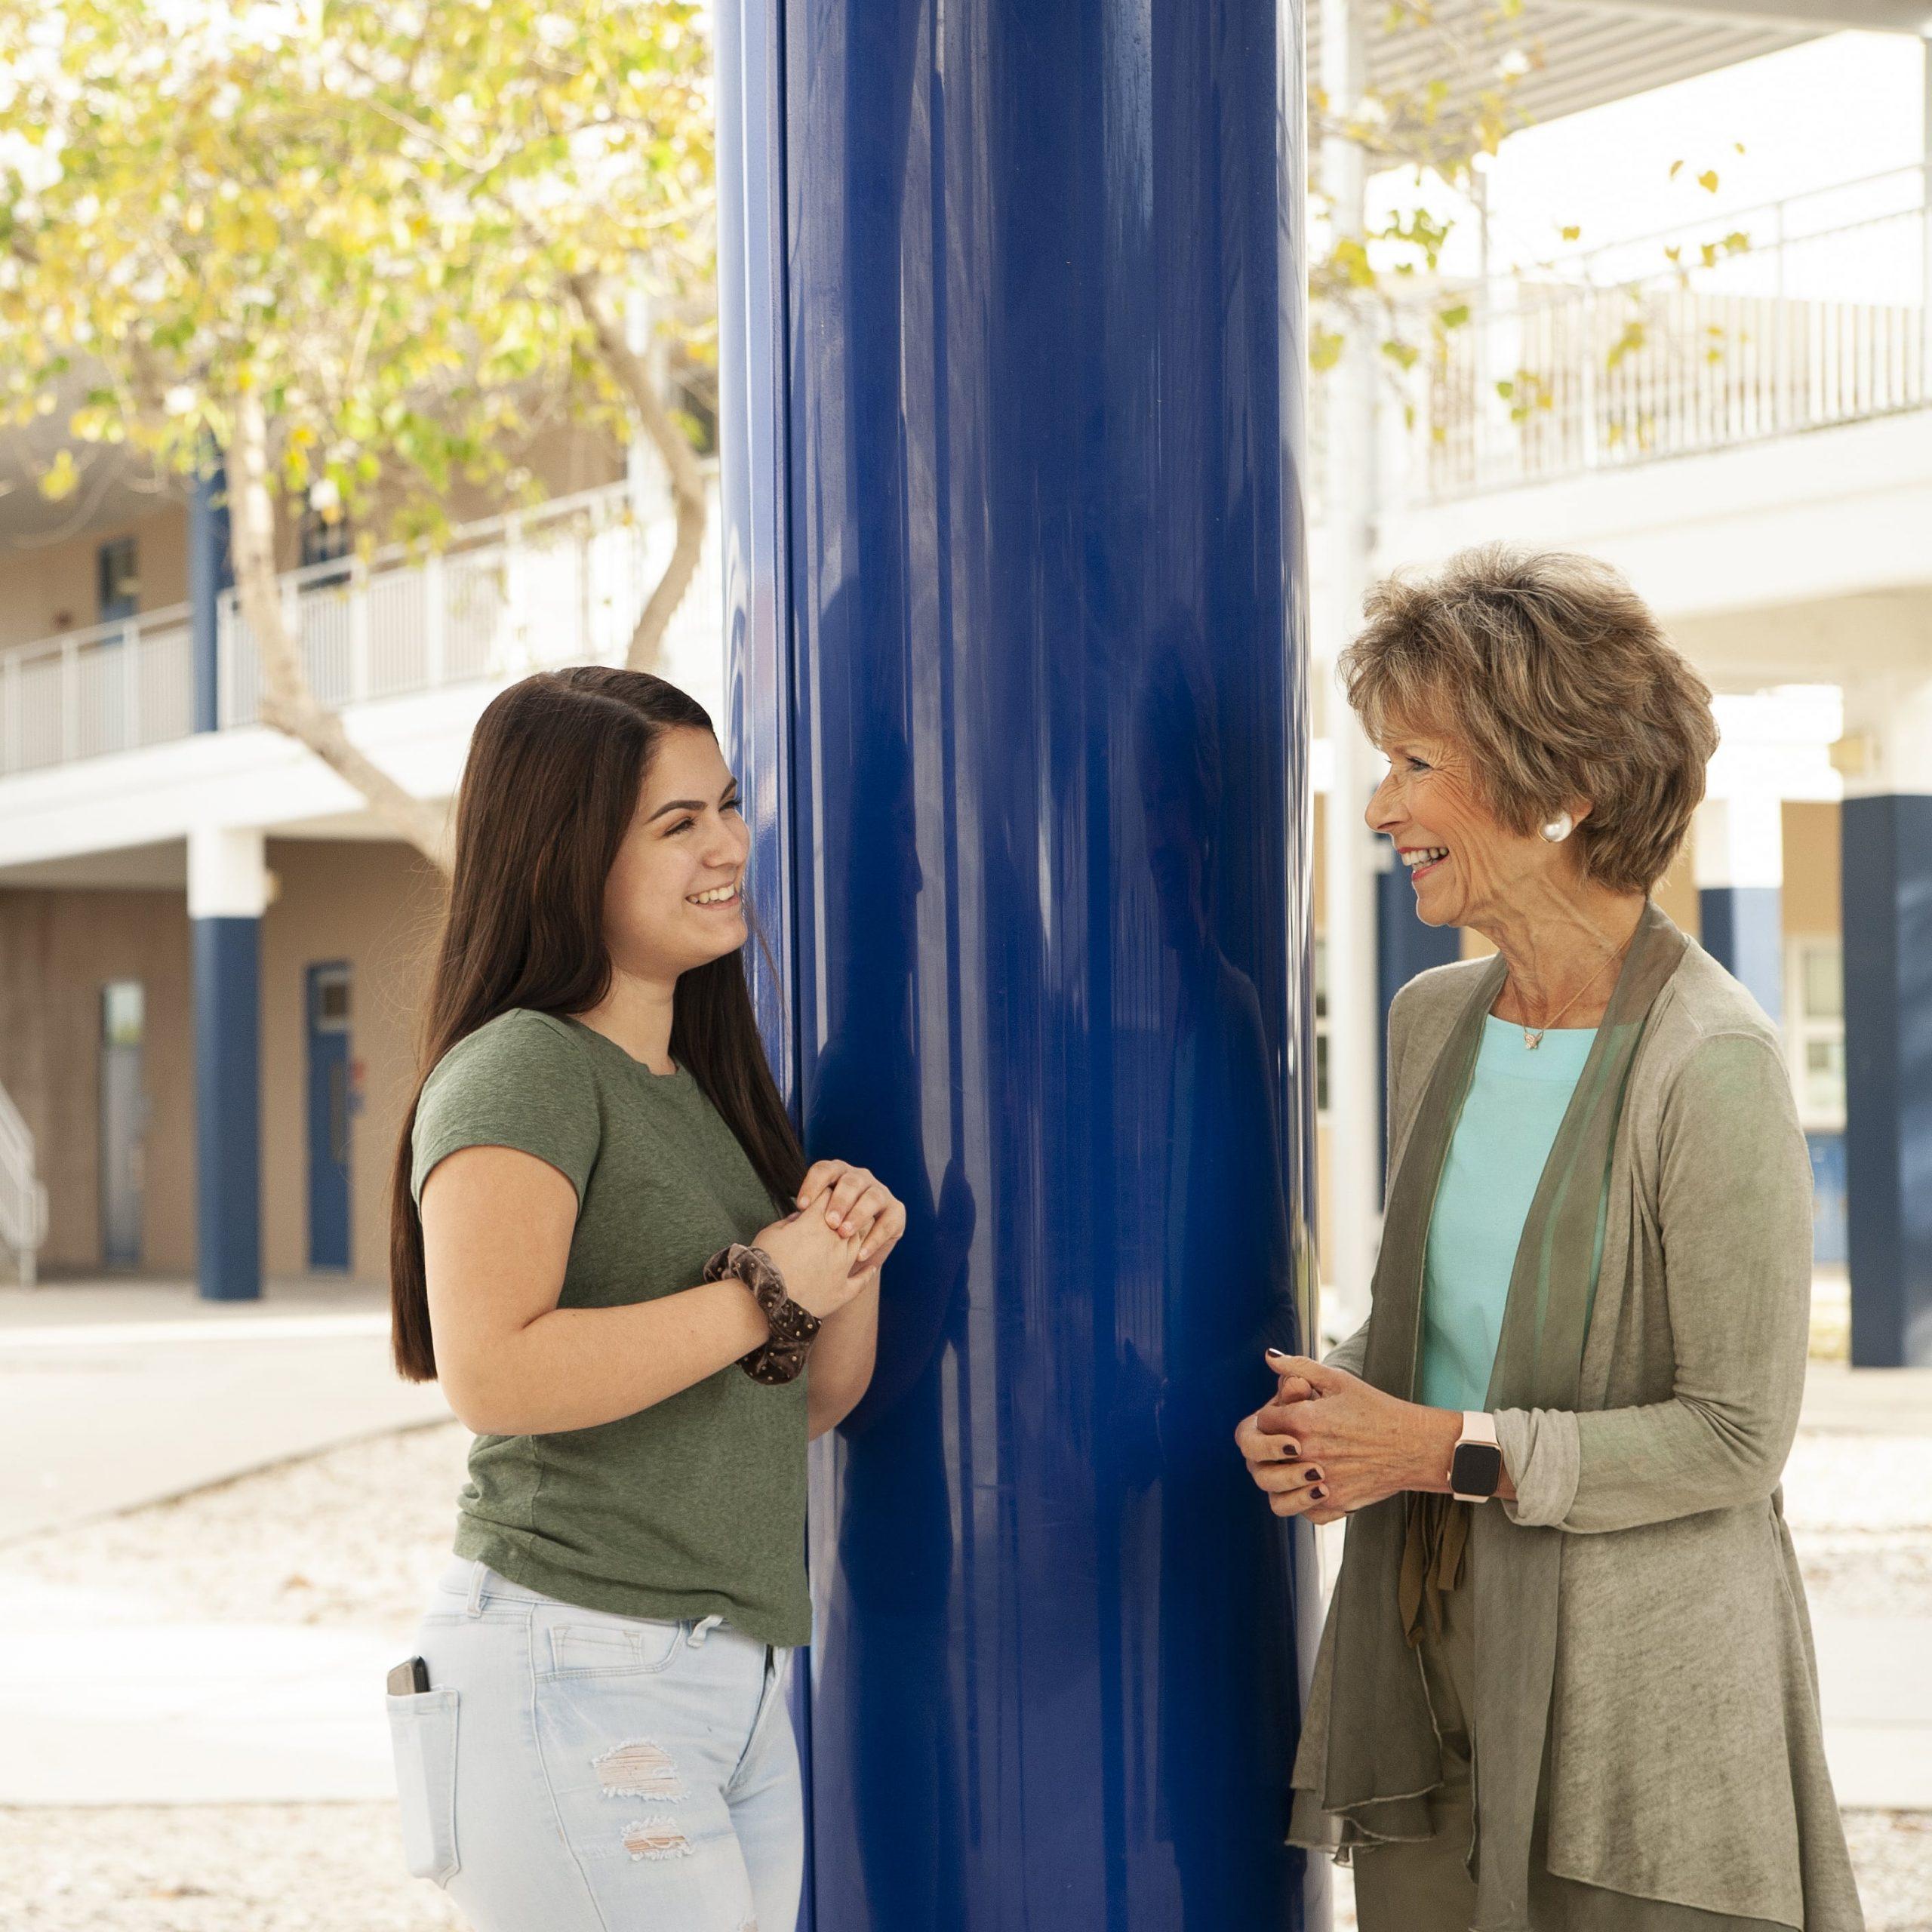 Samantha and Nancy | Student Mentoring Program